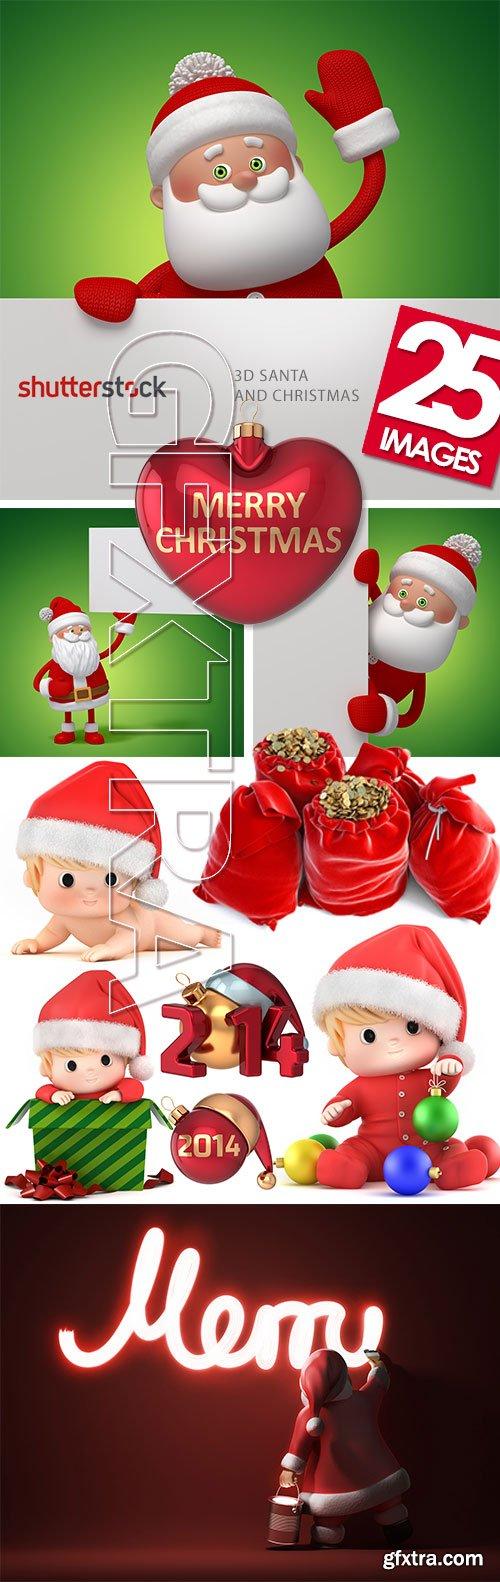 3D Santa and Christmas 25xJPG